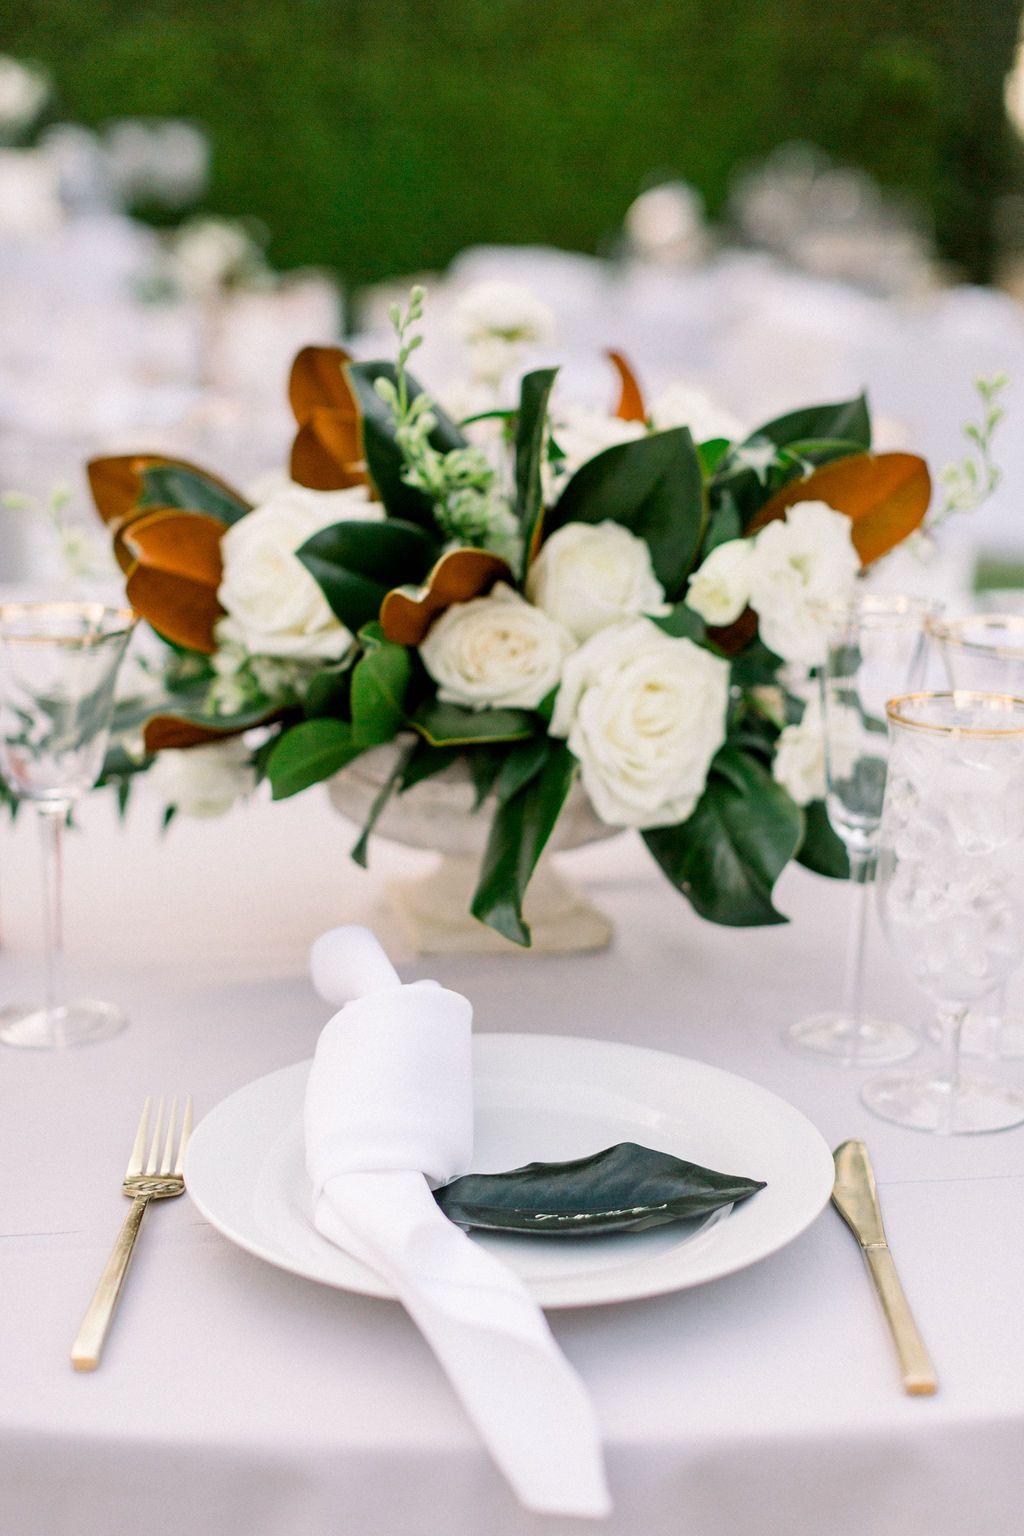 A Romantic Fall Wedding At Maravilla Gardens Feathered Arrow Wedding Planning Wedding Floral Centerpieces Wedding Flower Arrangements Autumn Wedding Reception